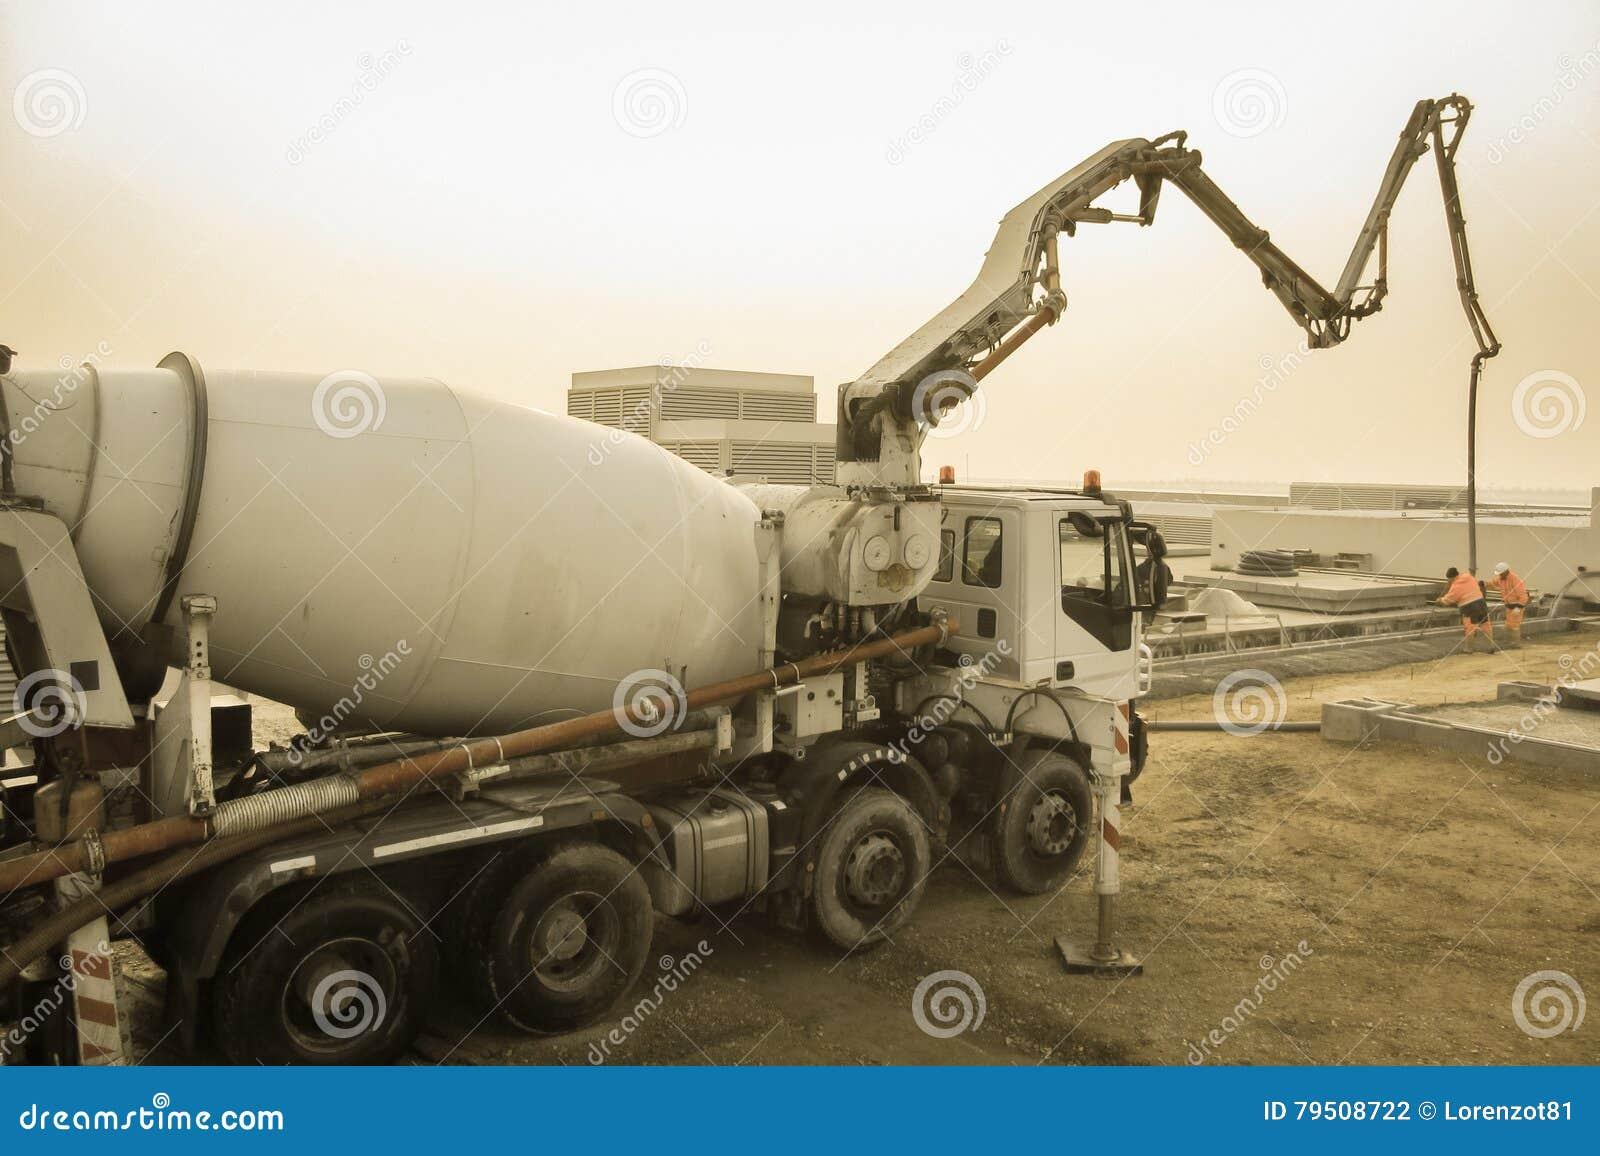 Cement mixer on construction site